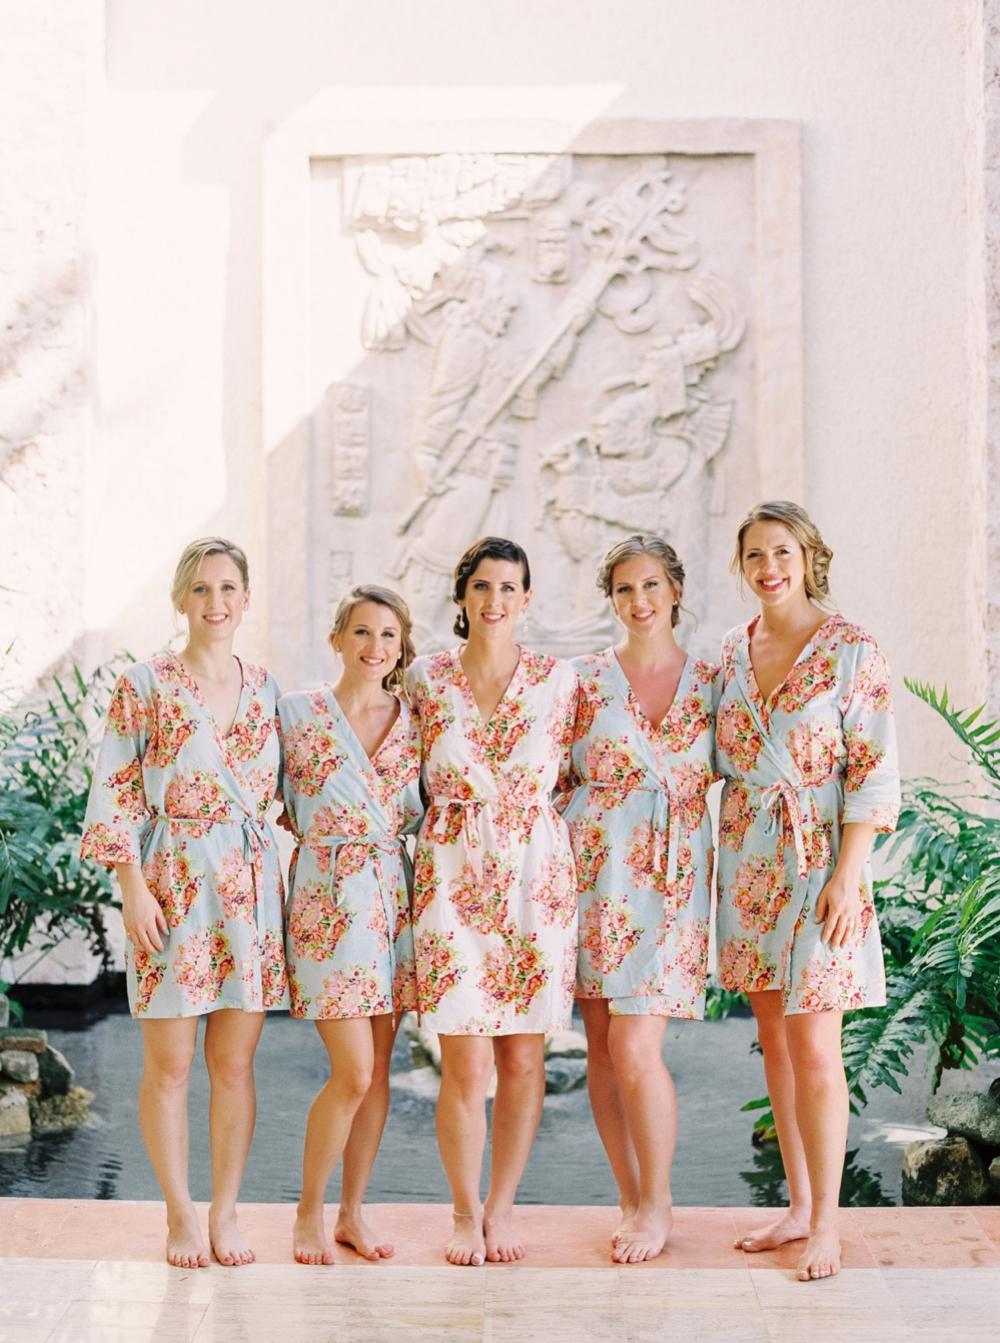 Destination wedding photographer | beach wedding | Calgary wedding photographers | Mexico wedding photography